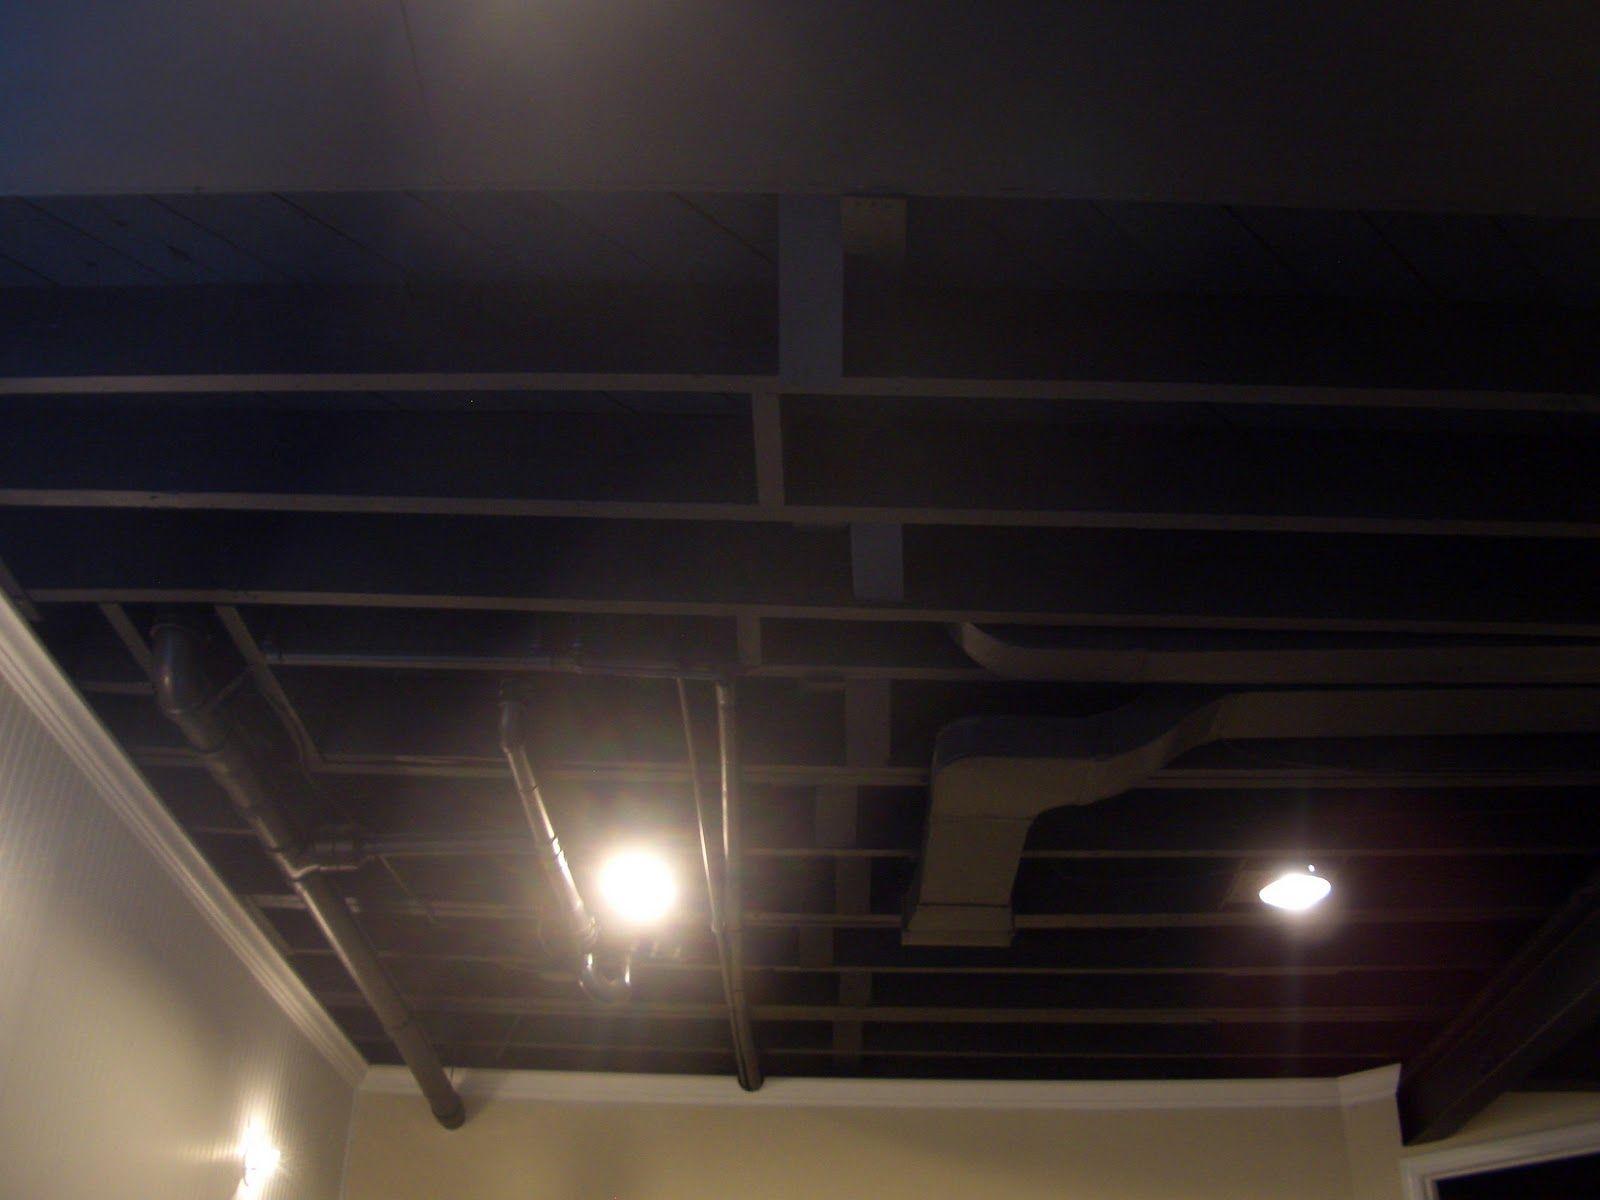 1000 images about basement on pinterest basement ceilings exposed basement ceiling and basements basement lighting options 1